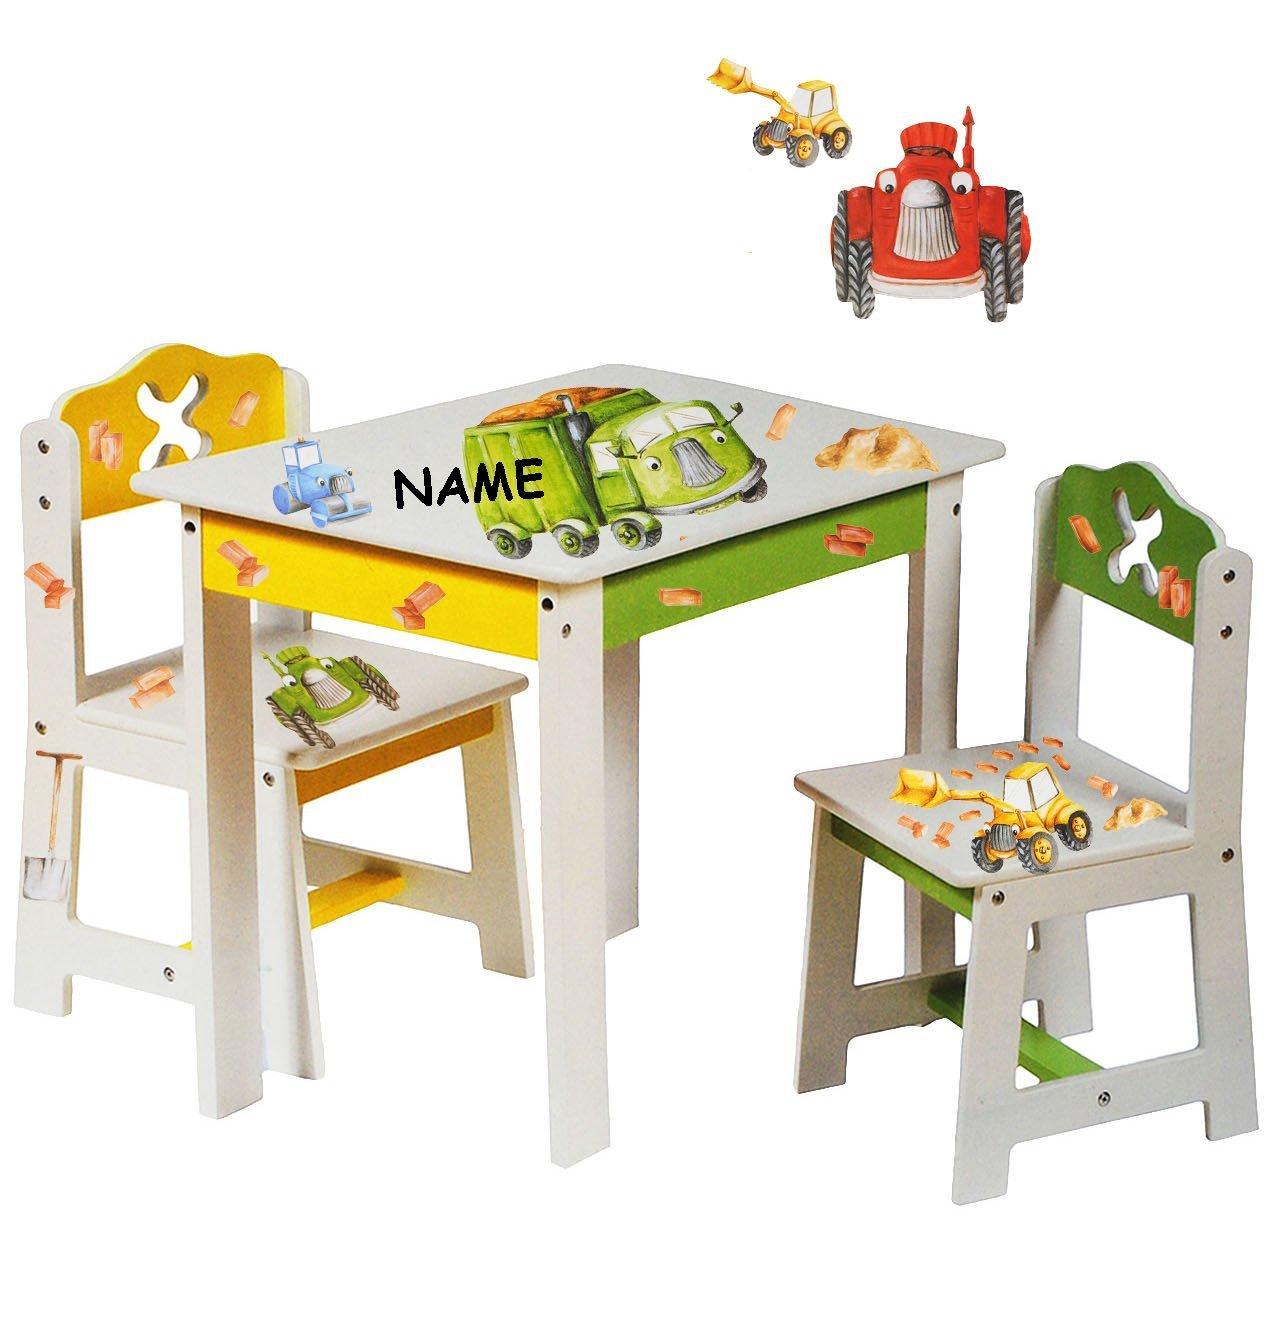 Stuhl für Kinder - aus Holz - \